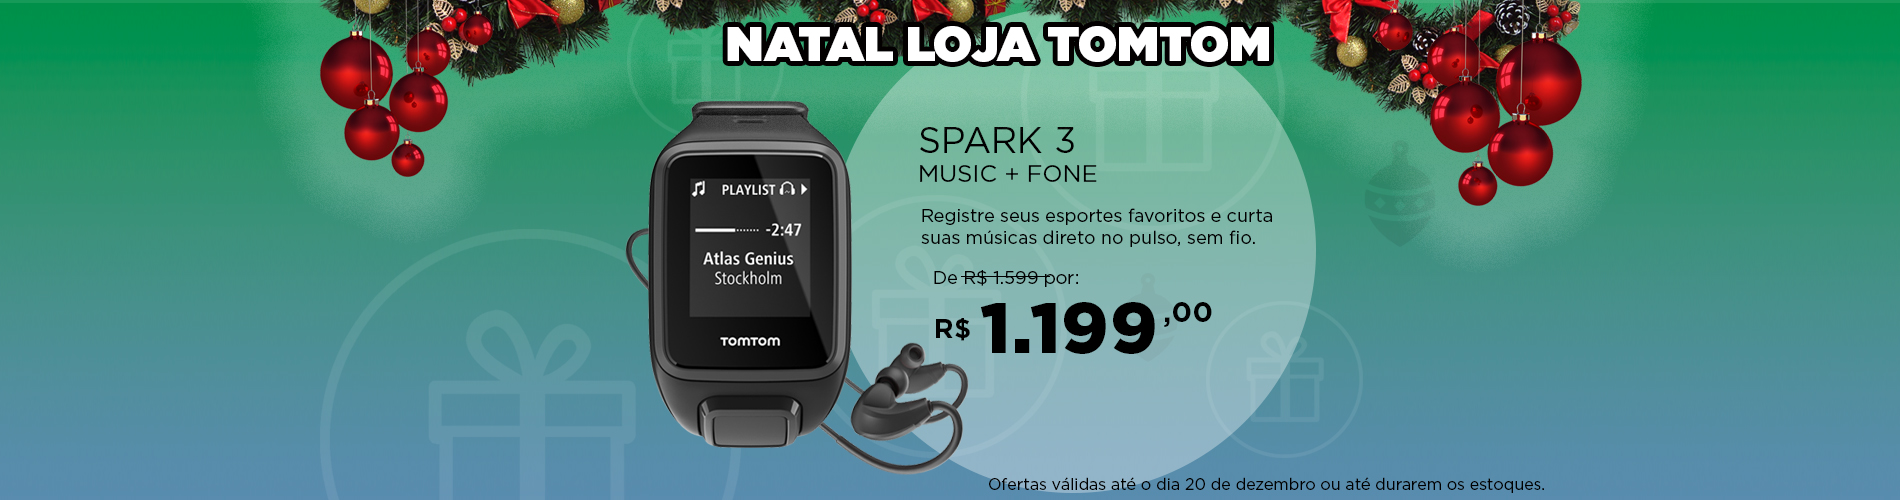 Spark 3 Music